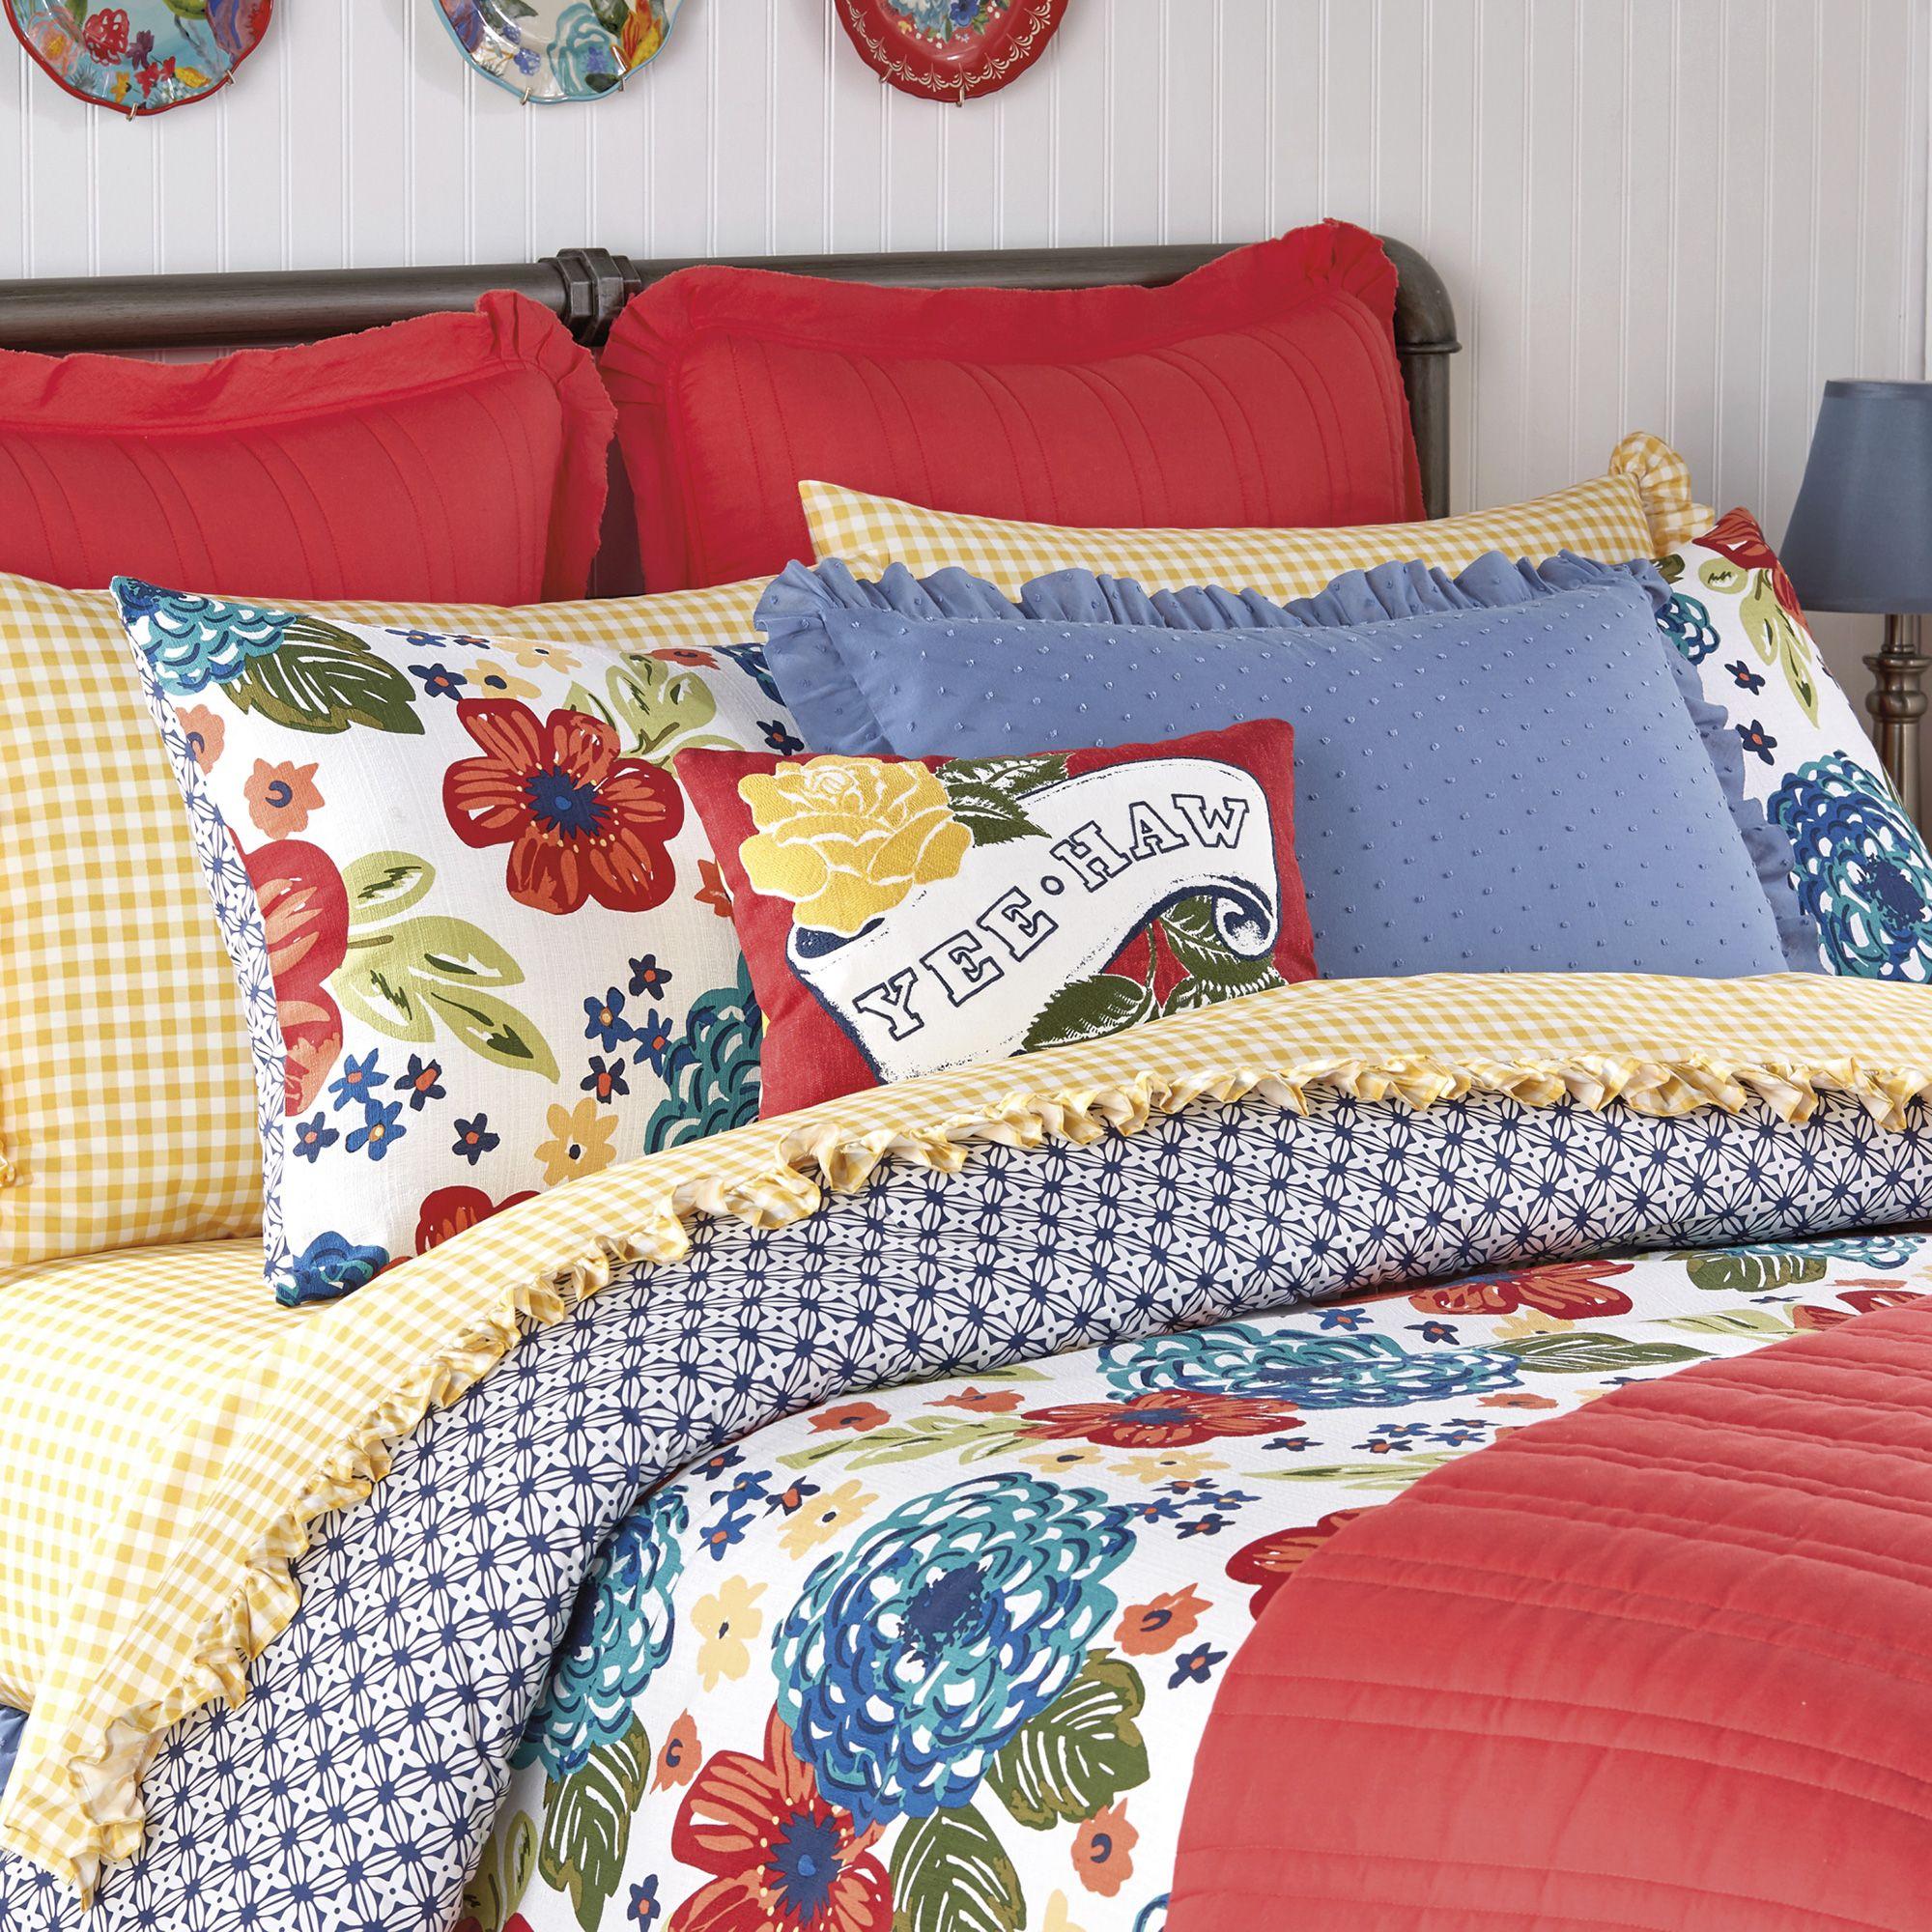 Pioneer Woman Ree Drummond Fall Bedding Line at Walmart   Pioneer woman kitchen, Fall bedding ...